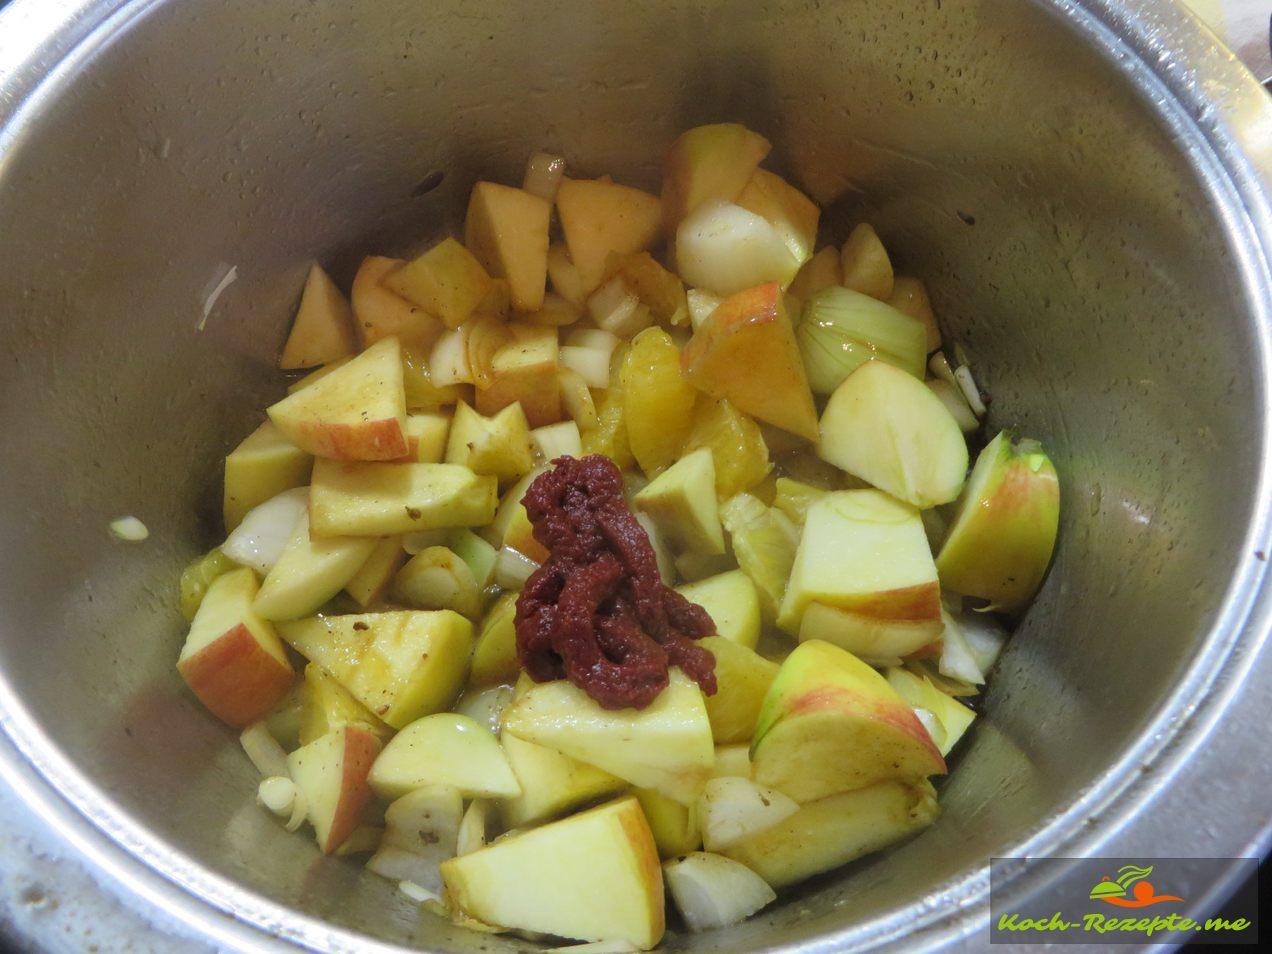 Sauce für Gänsebraten kochen, abgeschöpfter Gänseschmalz,  Apfel, Apfelsiene, Zwiebel ,Tomatenmark anbraten